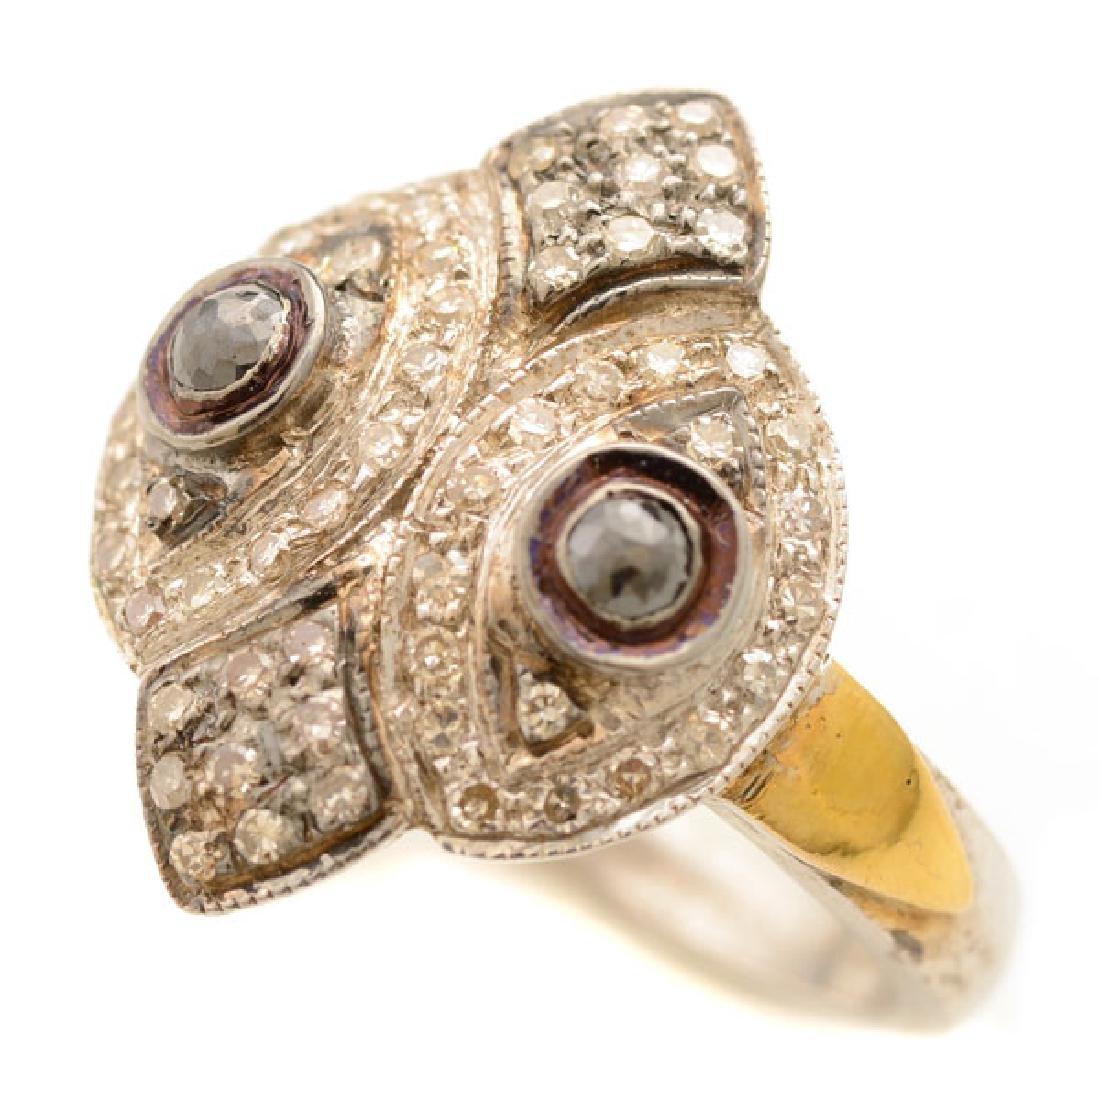 Diamond, Silver, 14k Yellow Gold Ring.